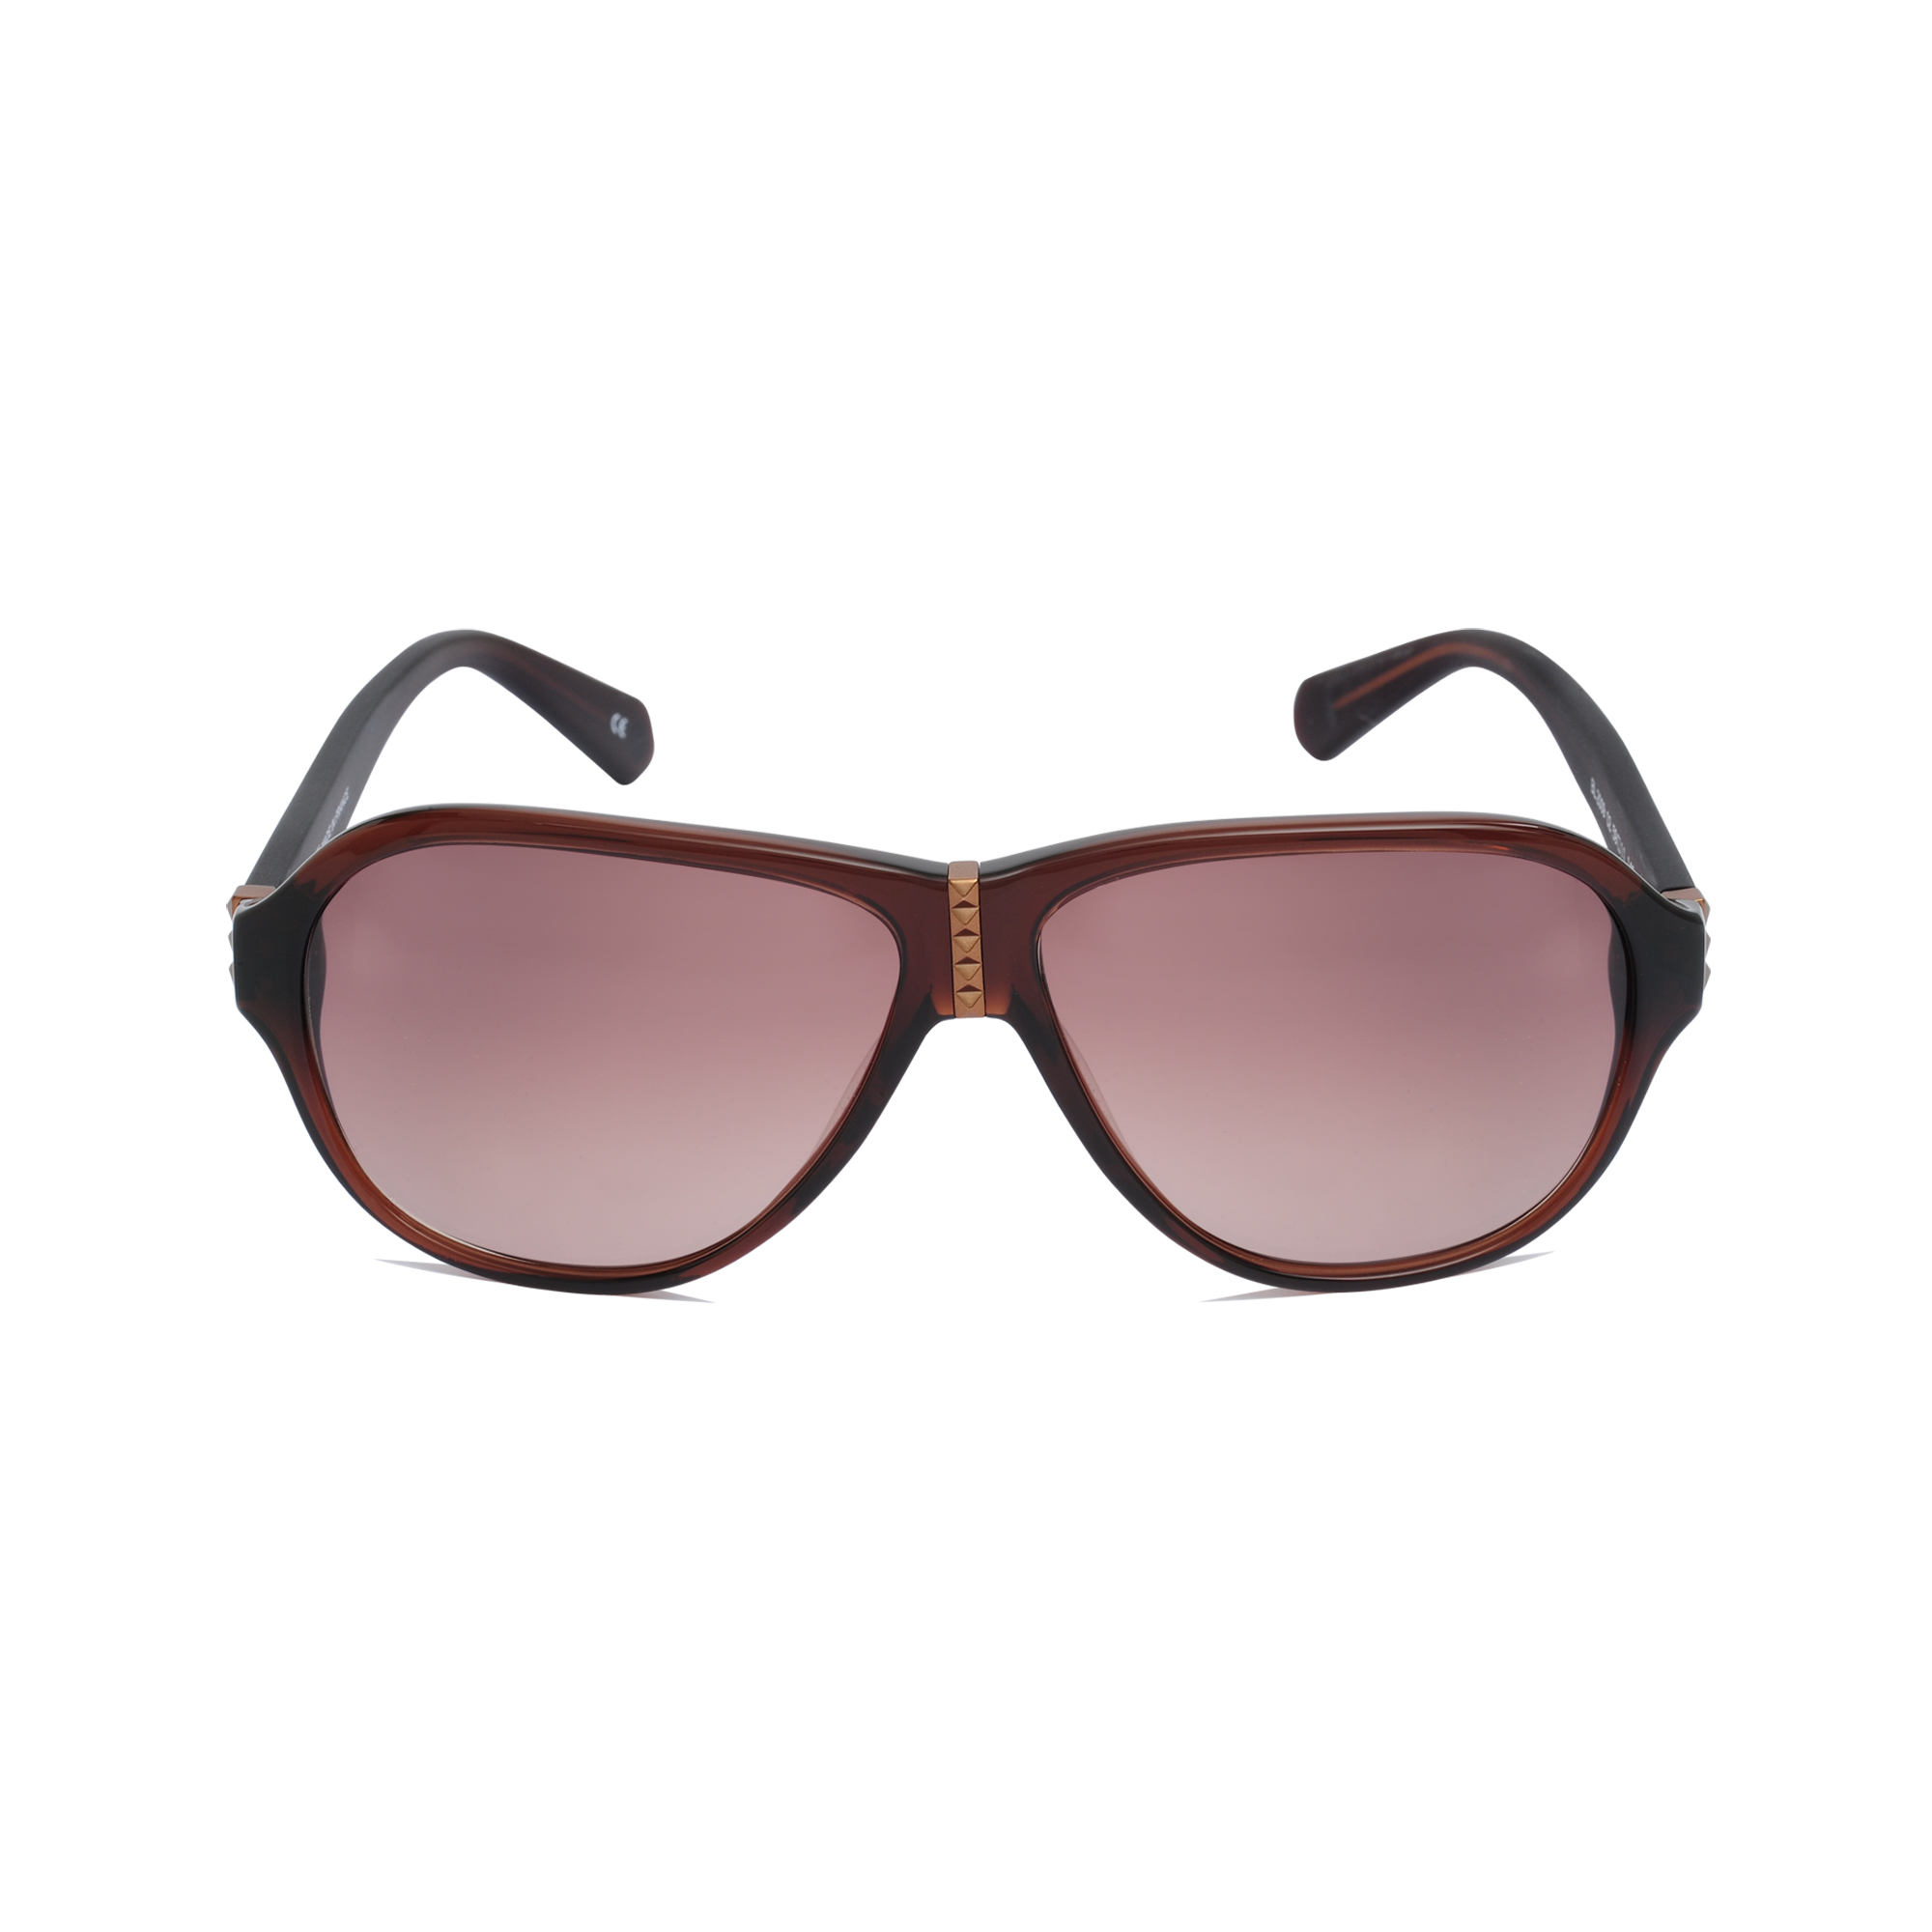 Balmain Bl2009 Studs Pilot Sunglasses in Purple